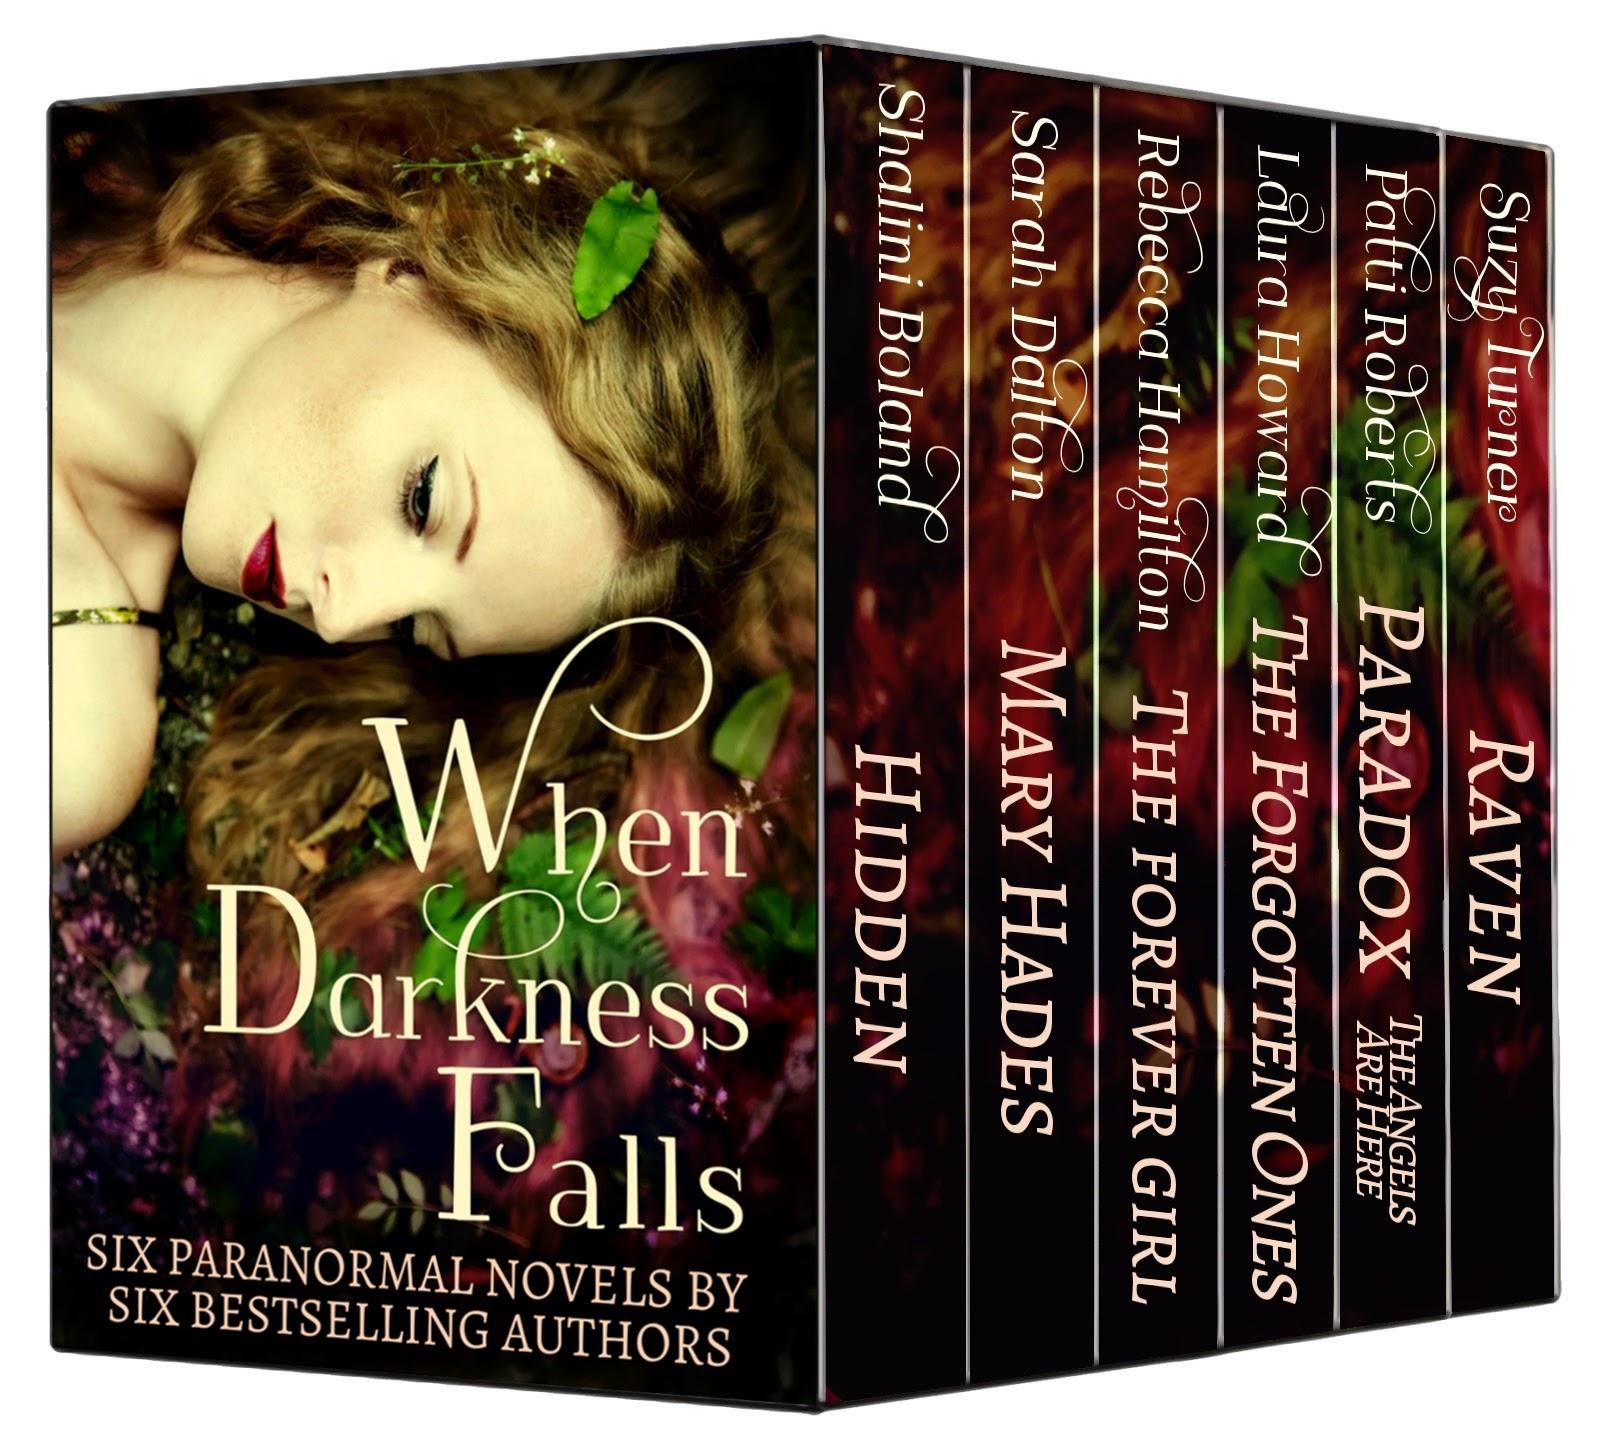 http://www.amazon.com/When-Darkness-Falls-Paranormal-Novels-ebook/dp/B00N7I5SB8